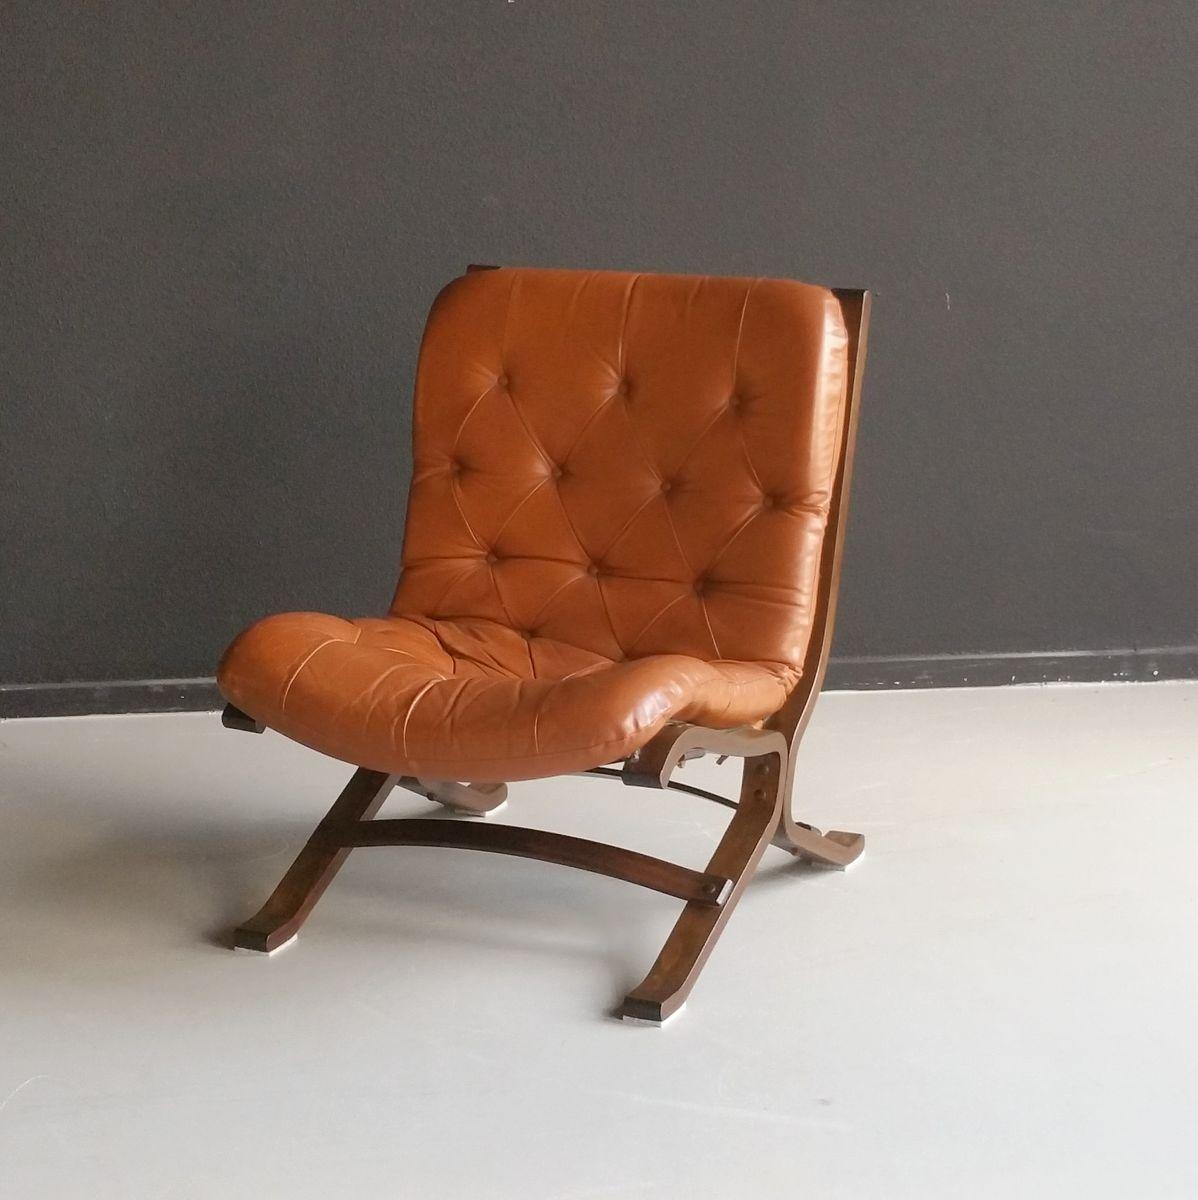 Sessel von ingmar relling f r westnofa 1960er bei pamono for Sessel auf englisch